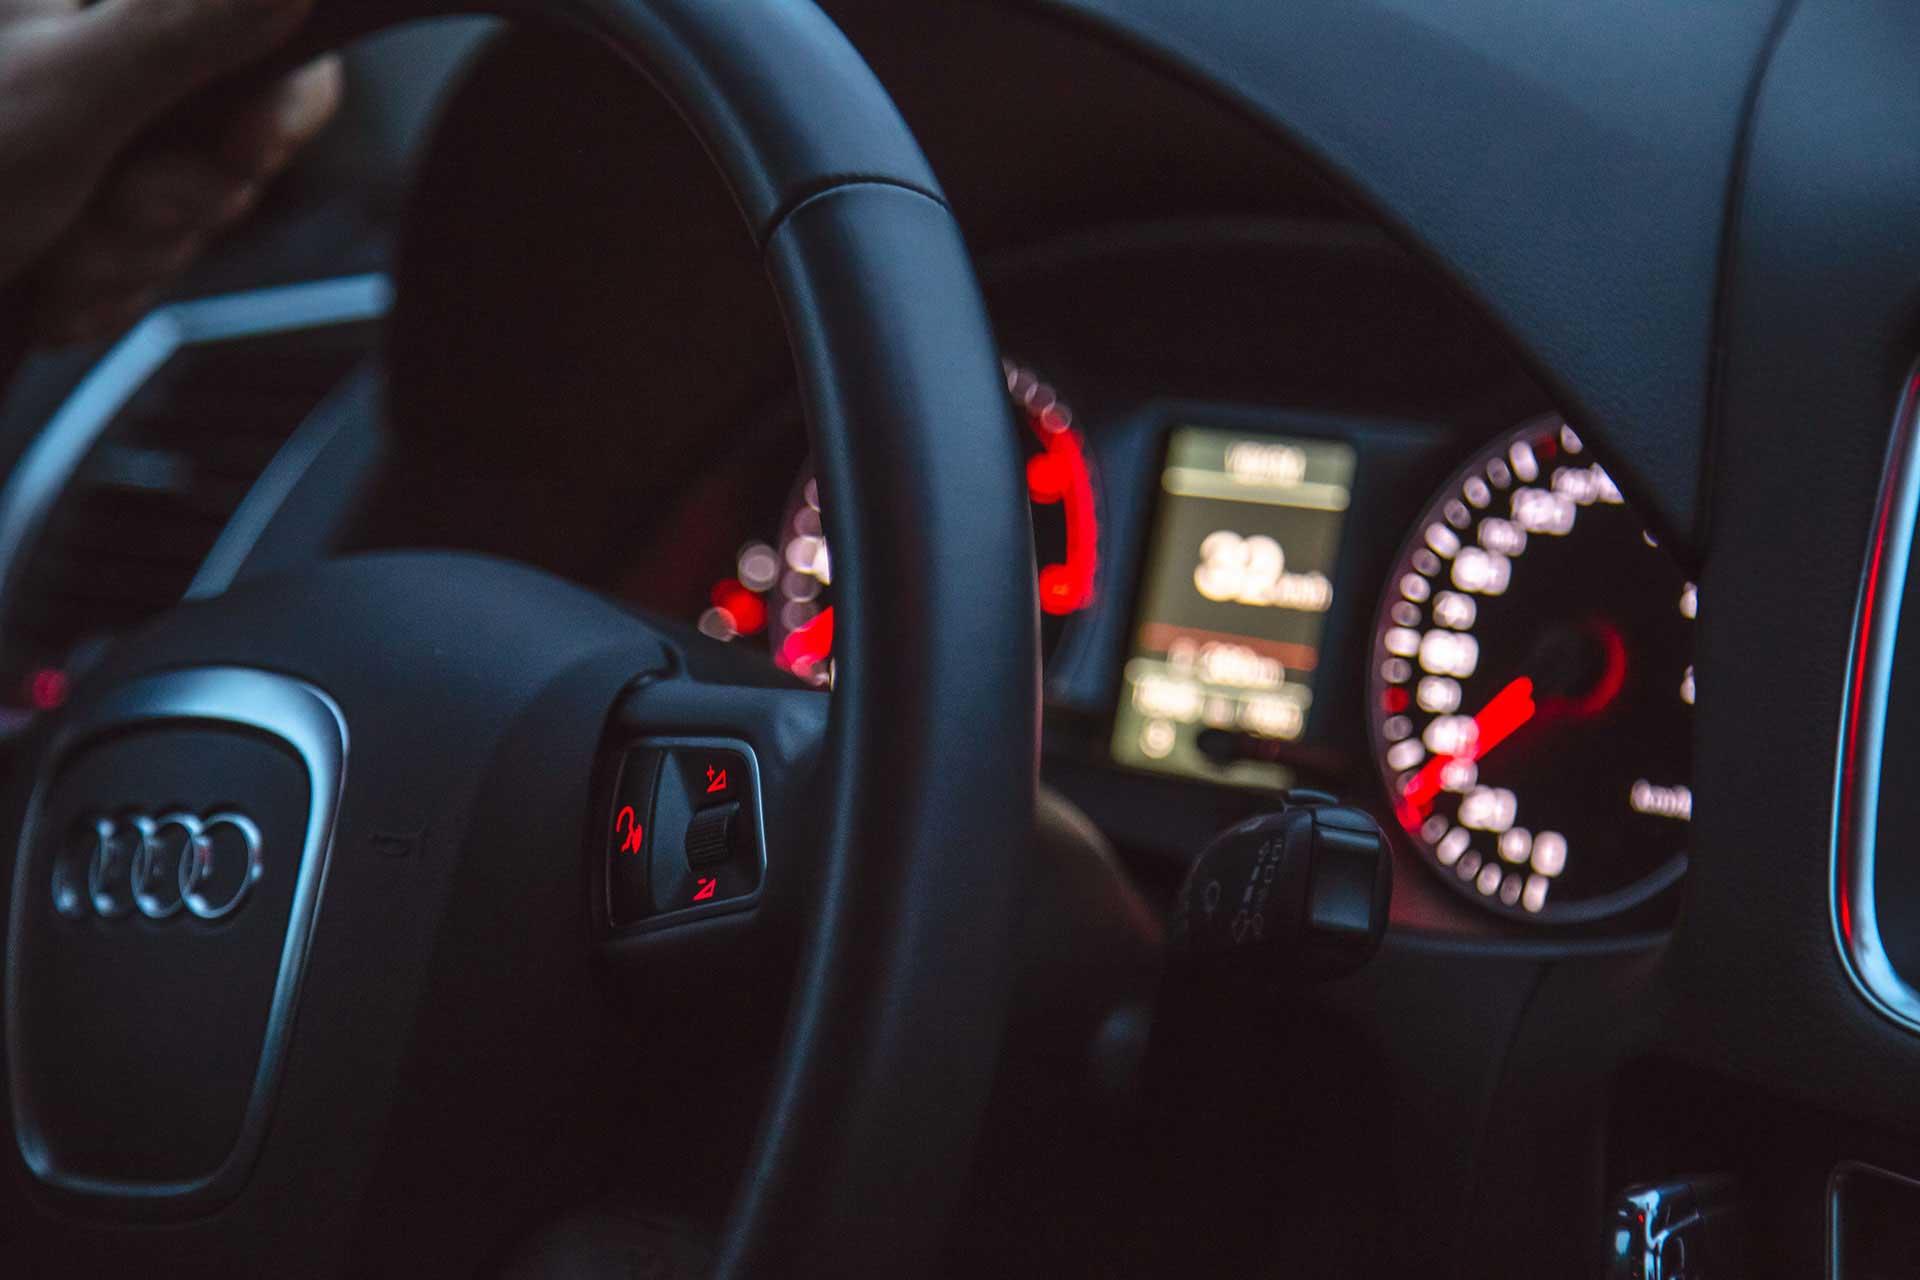 Armaturenbrett eines Audis